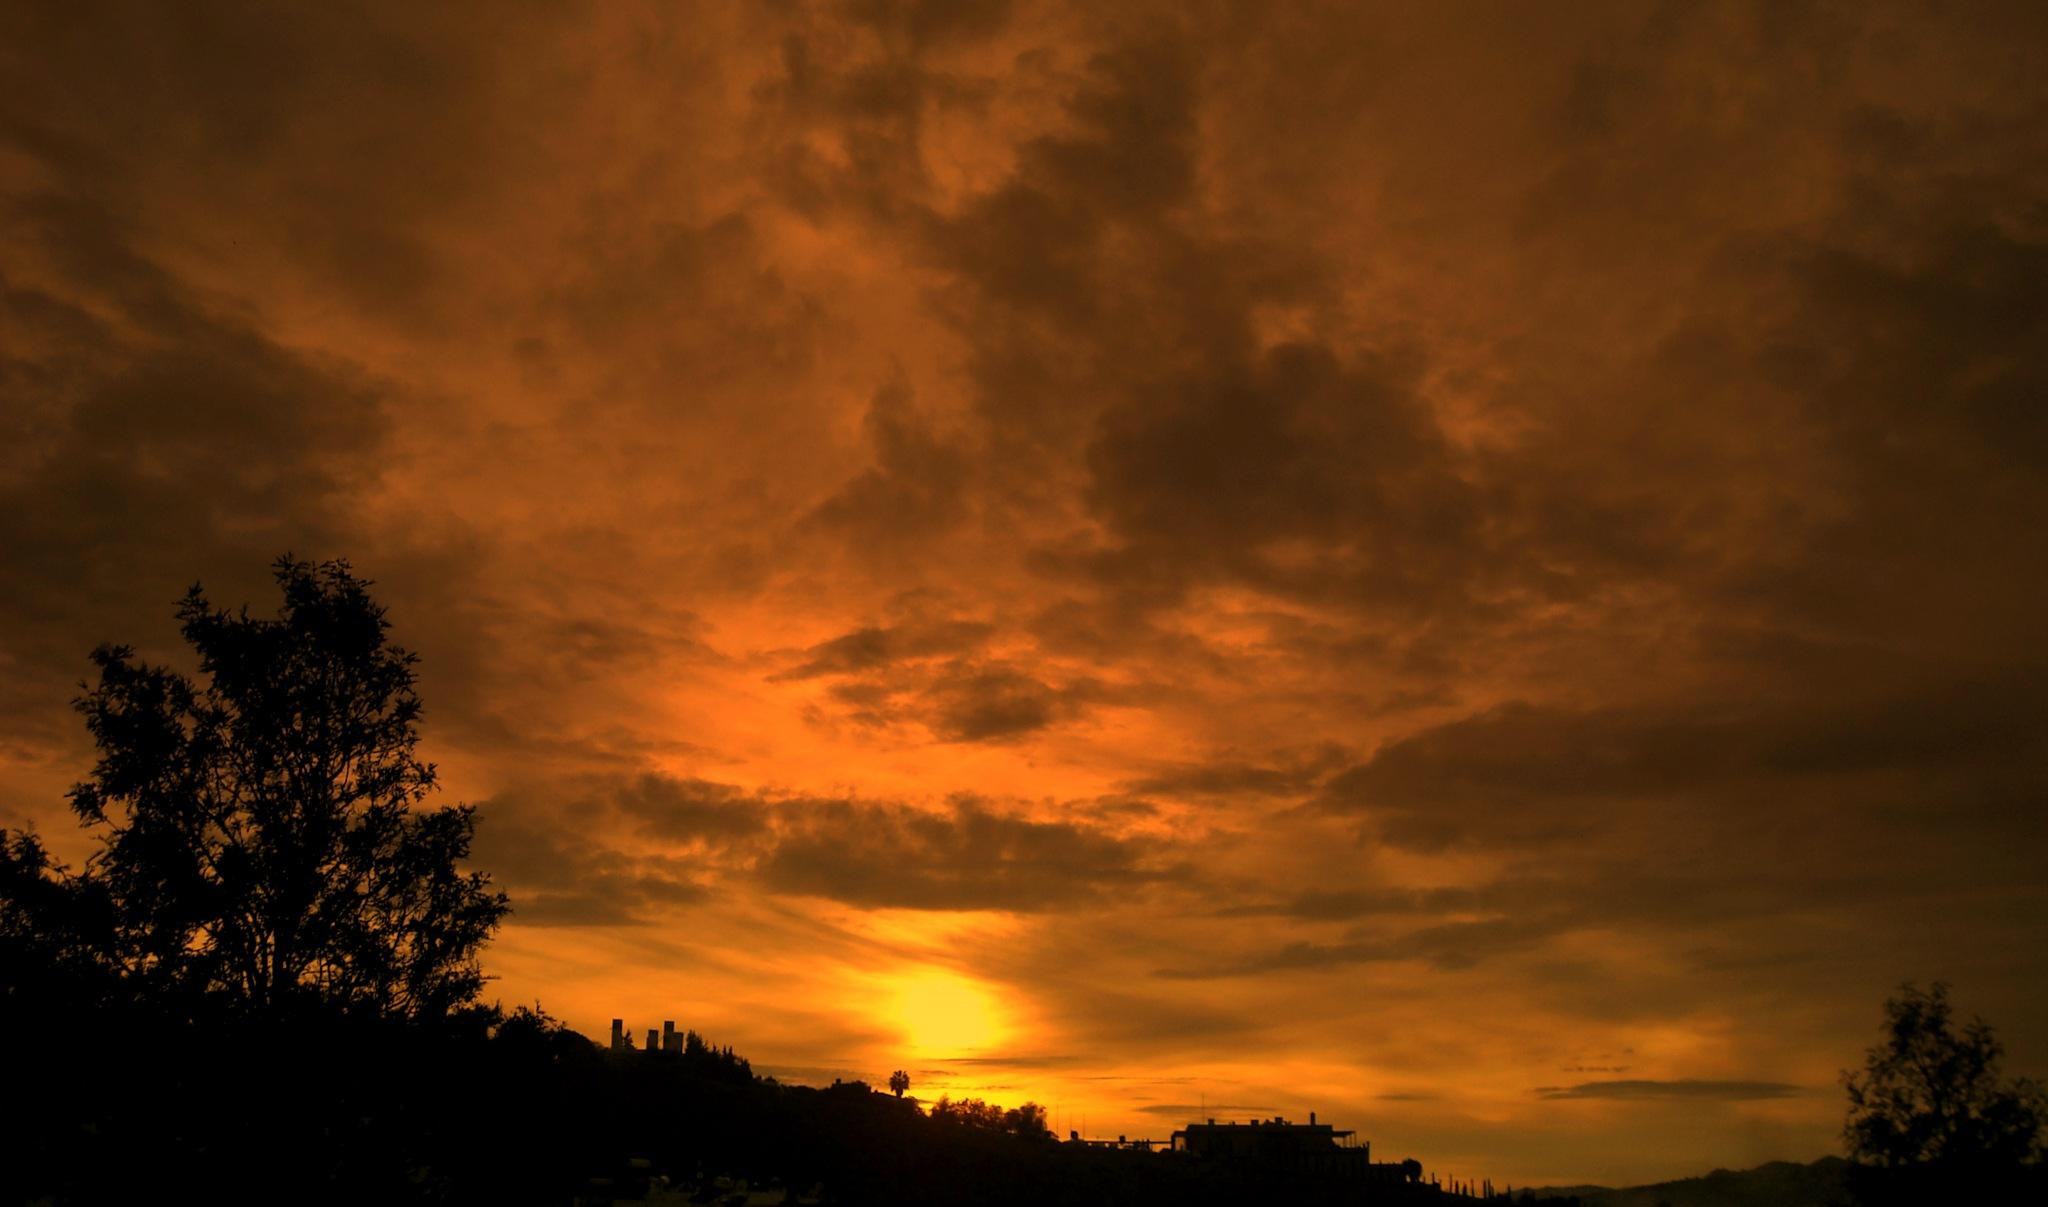 BEAUTIFUL SUNSETS 50, FULL SCREEN by Akin Saner